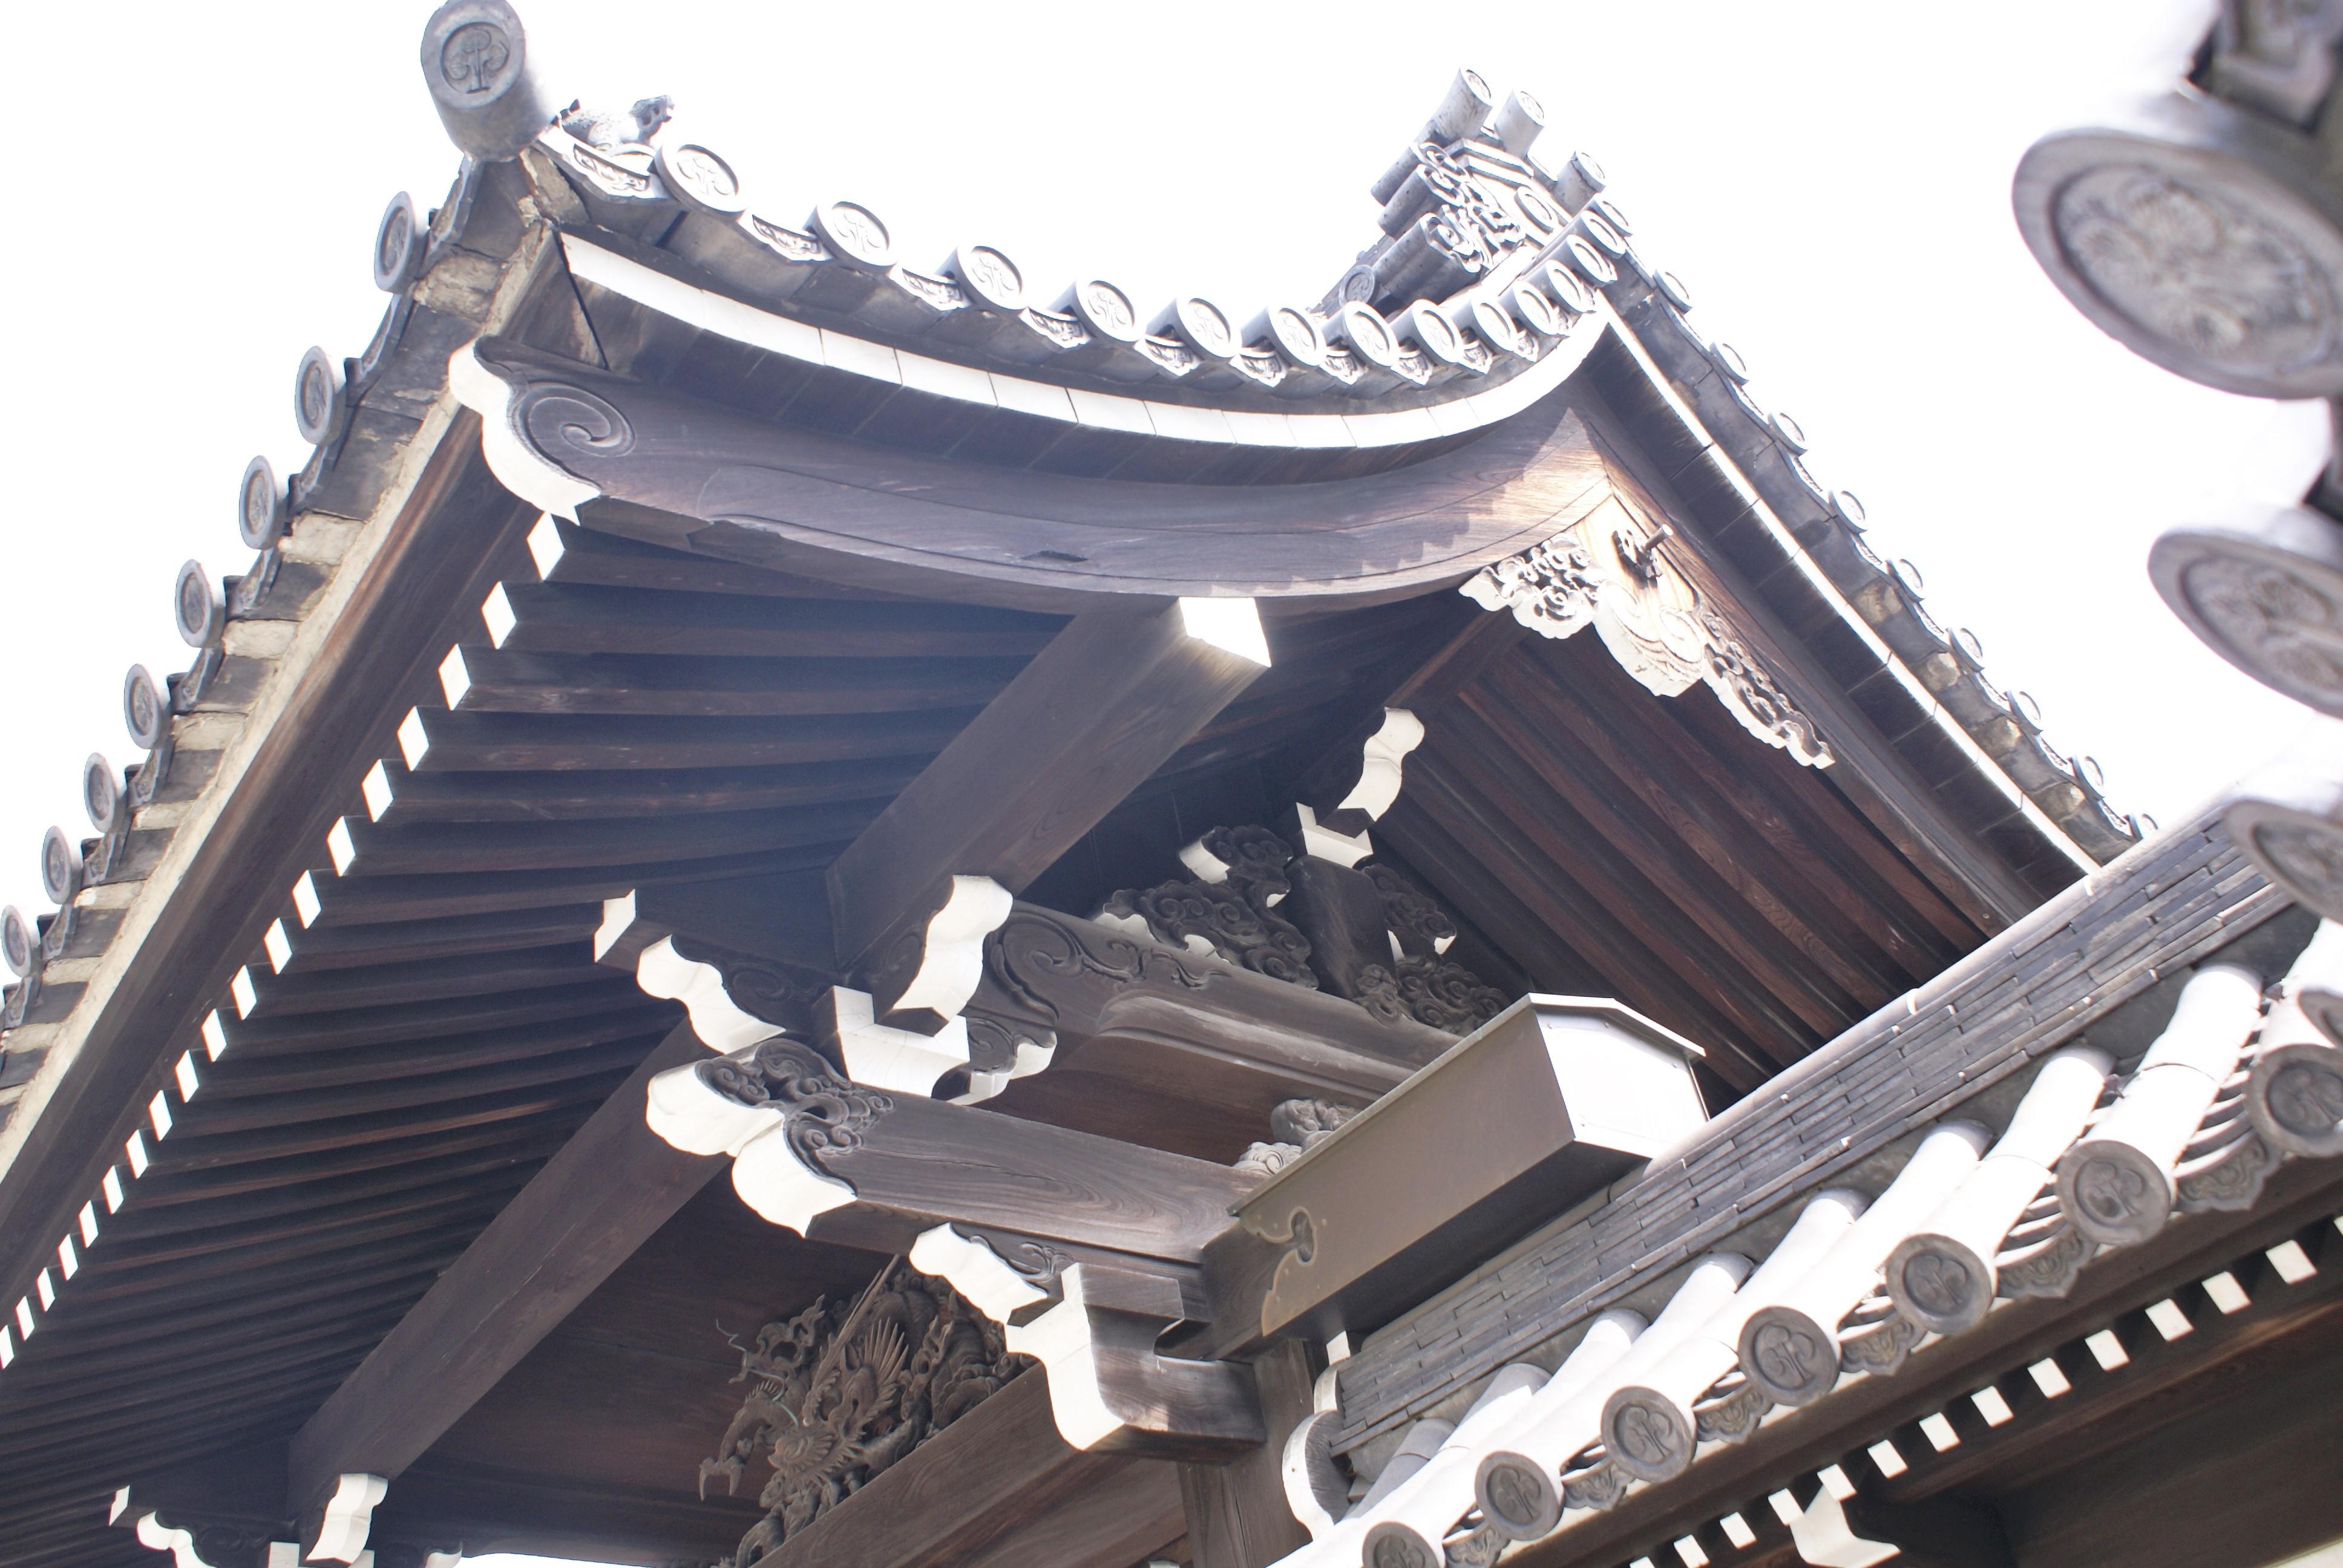 <p>妻側から架構を見る。</p>大斗肘木を組み、虹梁と軒桁を支持。大瓶束の両脇に笈形(装飾として置く彫り物)が付く。